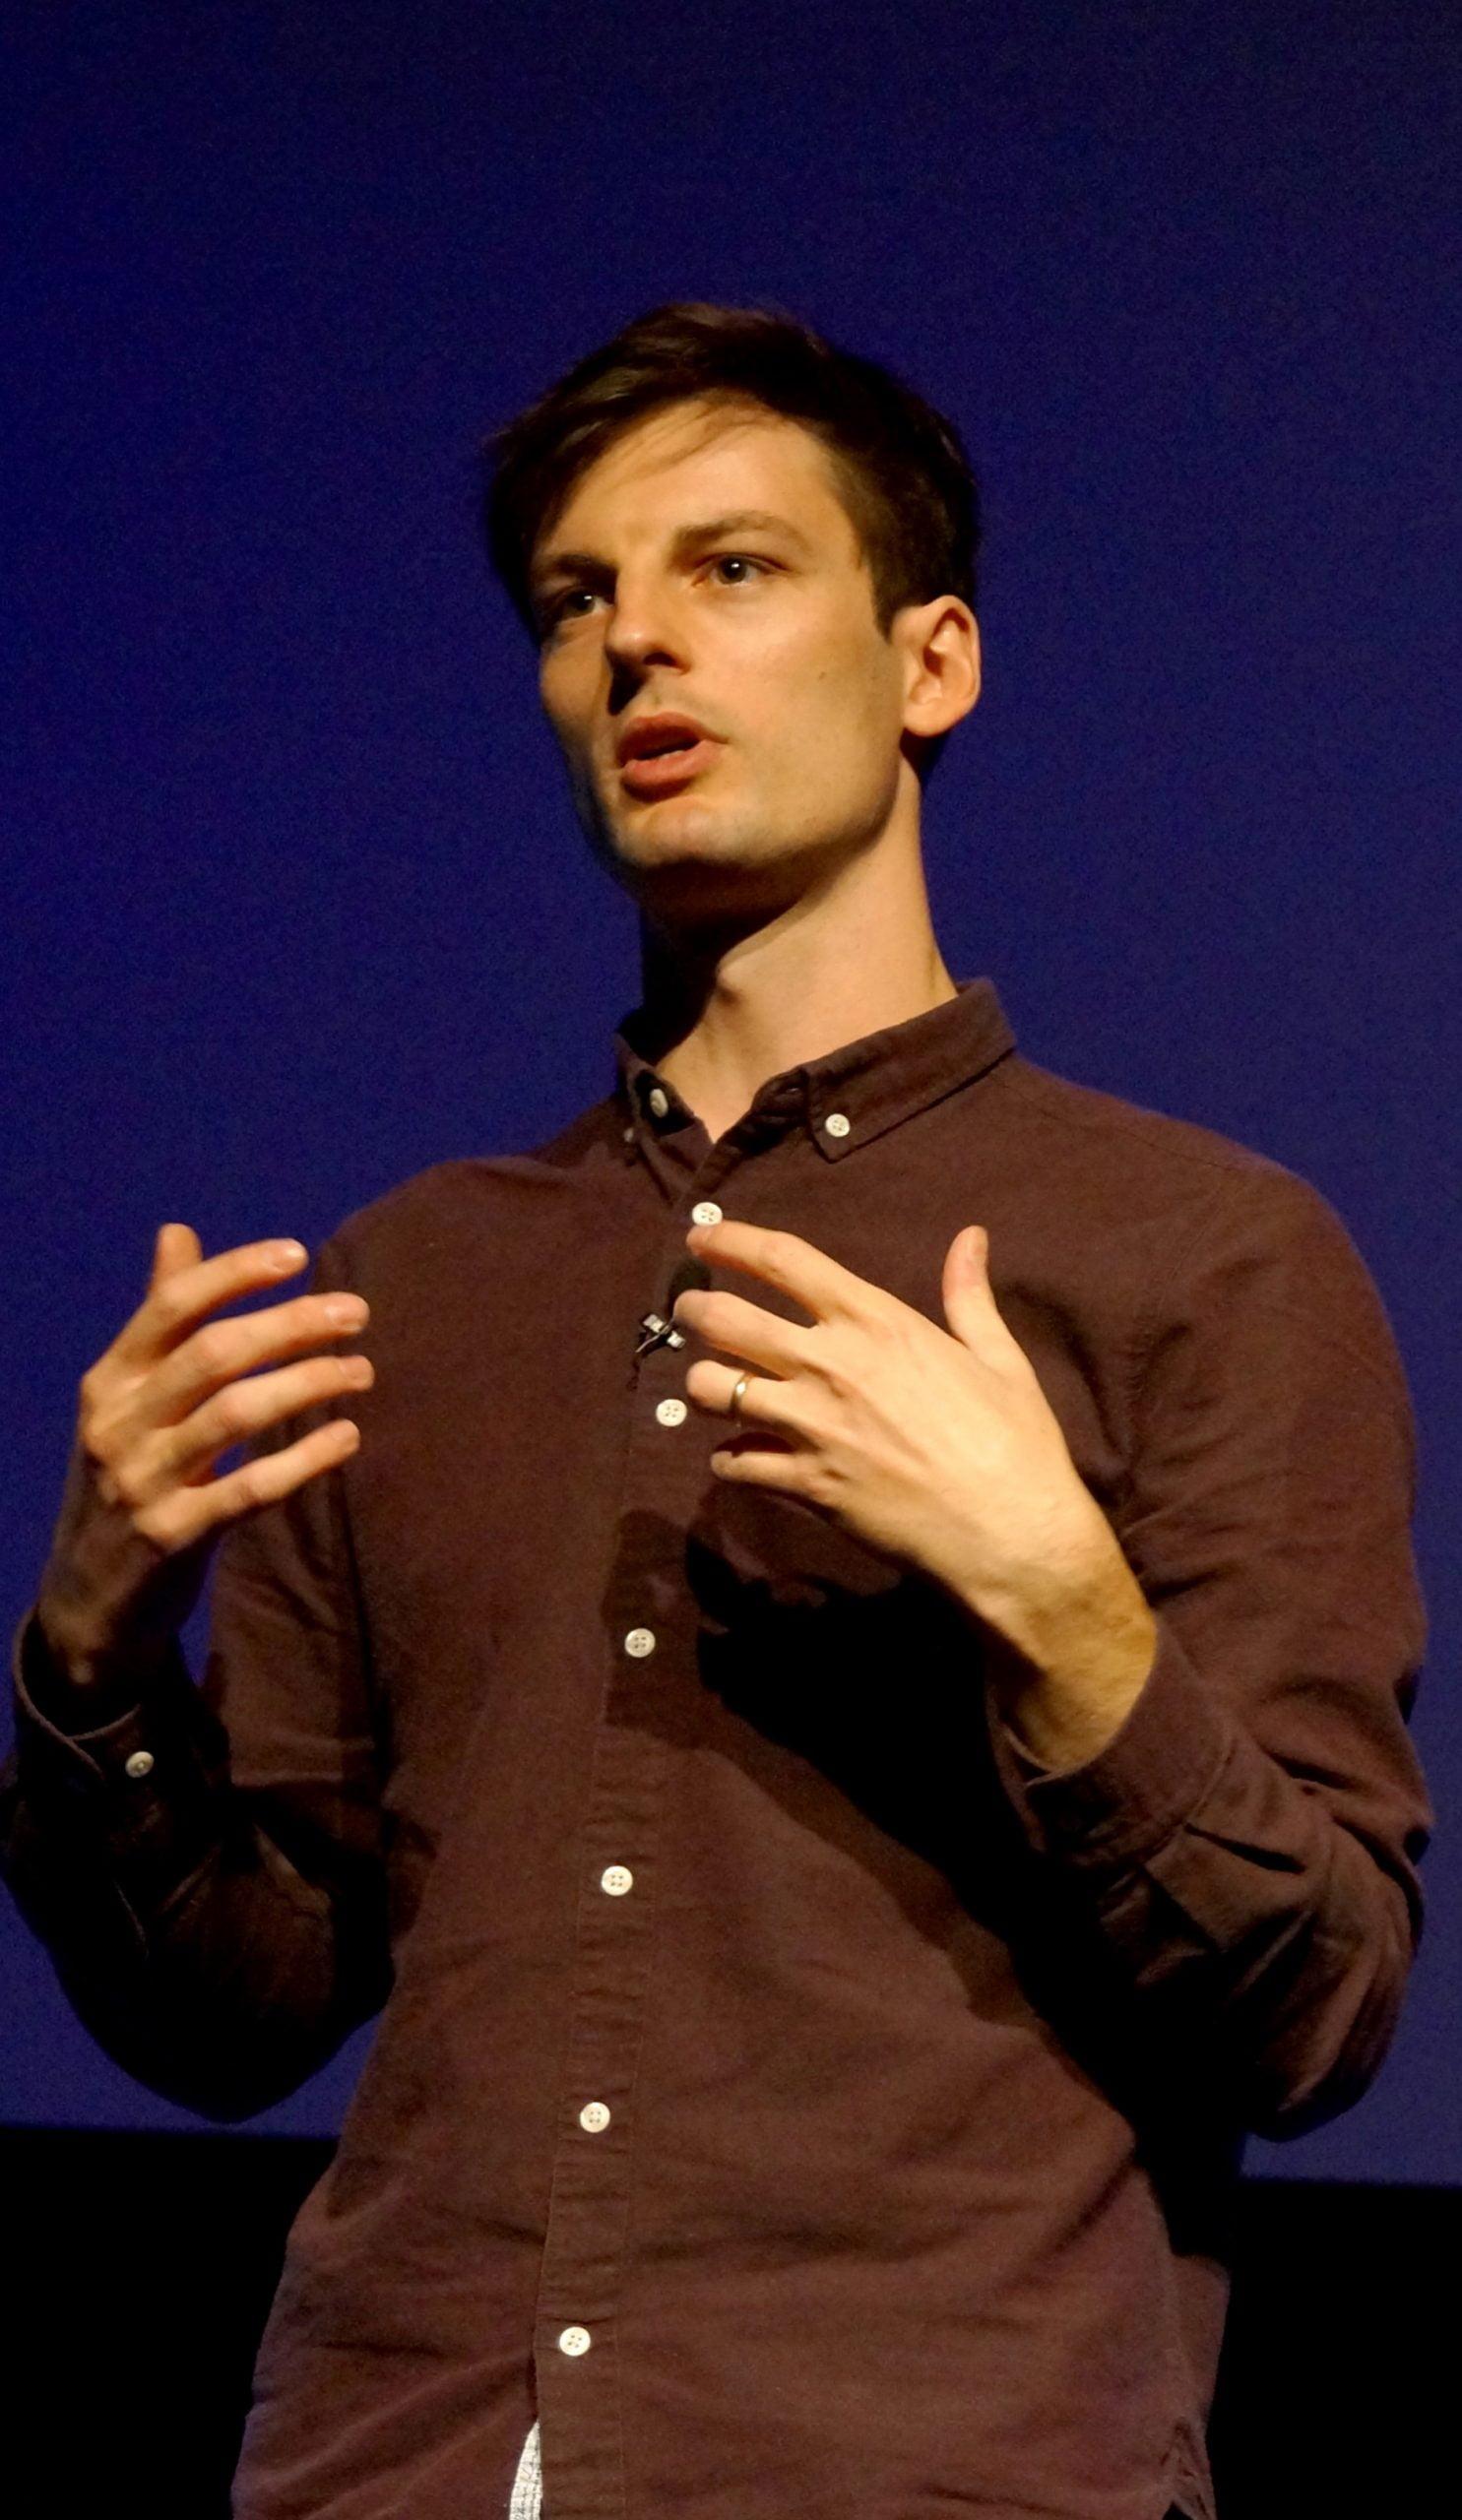 Ed Newton-Rex keynote speaker